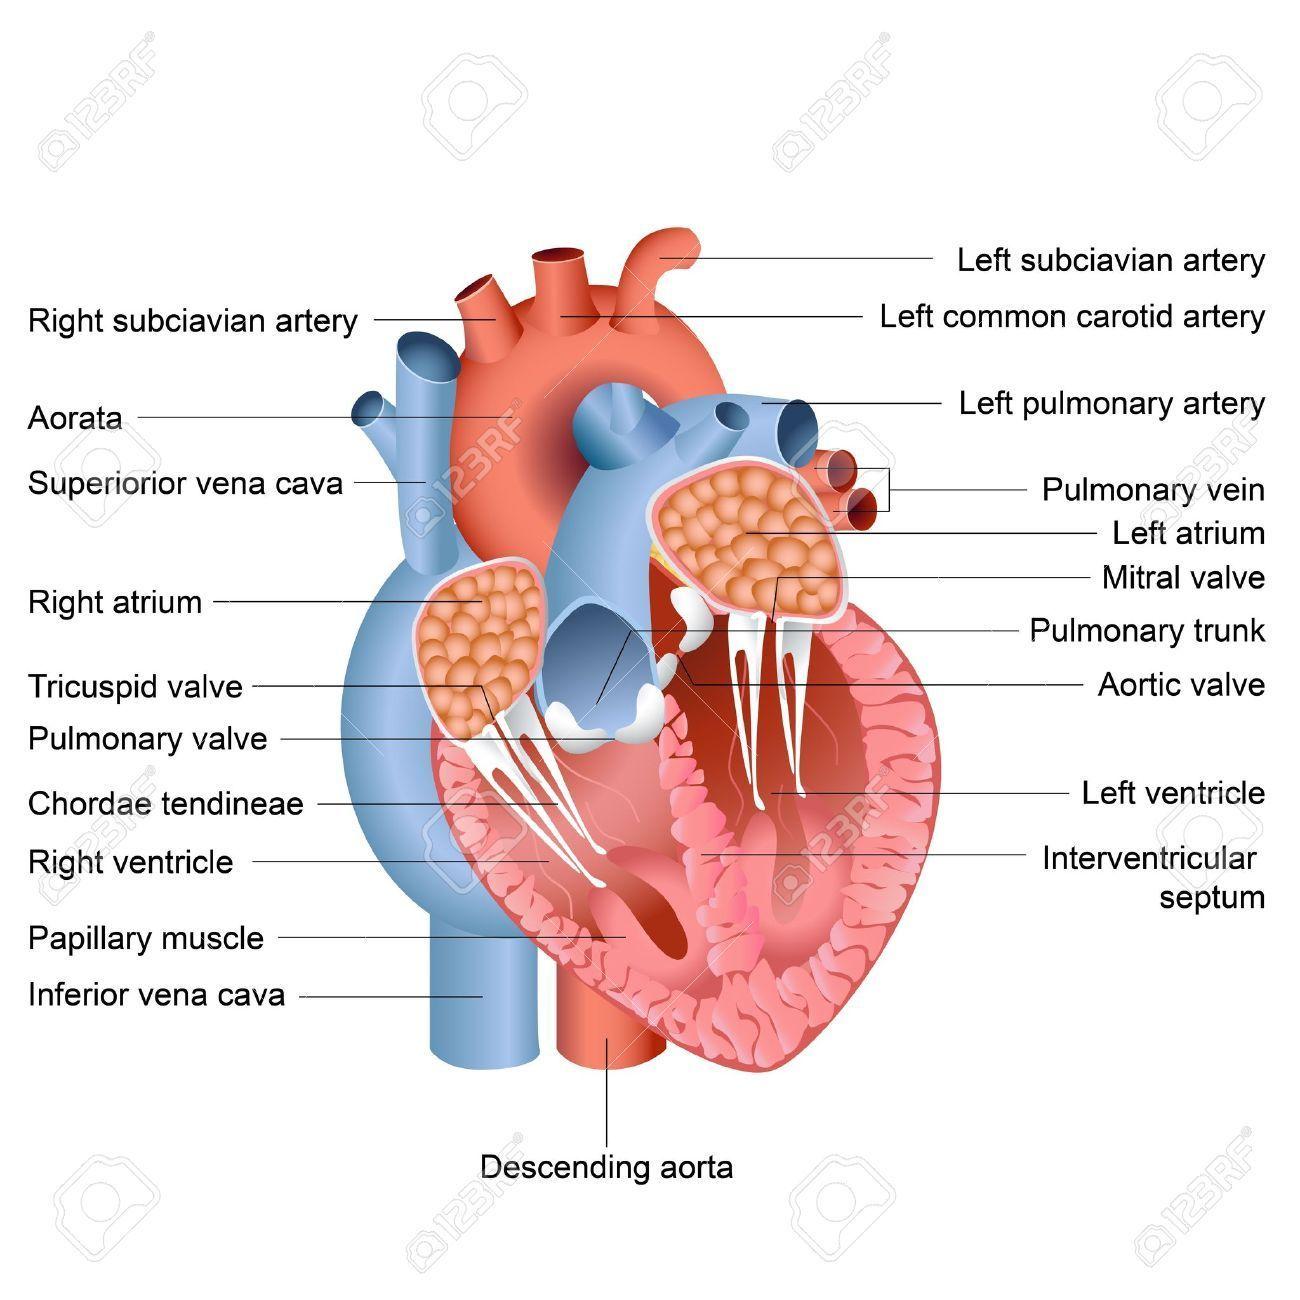 medium resolution of human heart labeled human heart labeled simple human lungs andhuman heart labeled human heart labeled simple